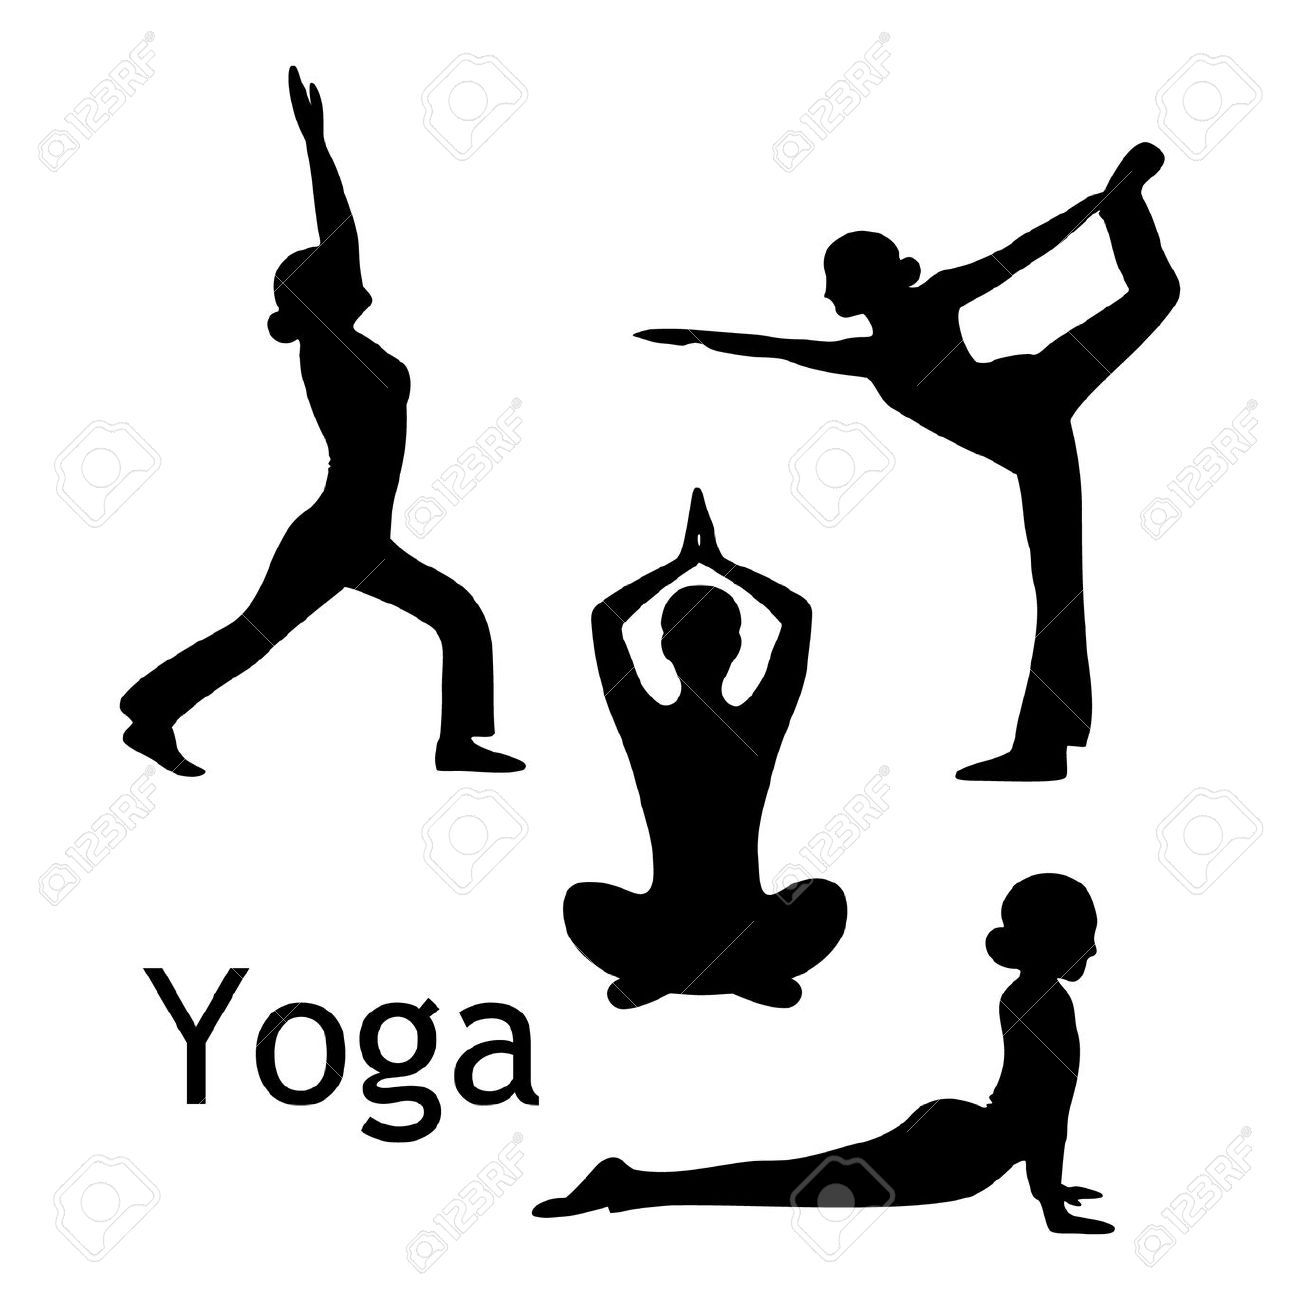 Yoga Pose Clipart 1 Meditation Poses Poses Free Meditation